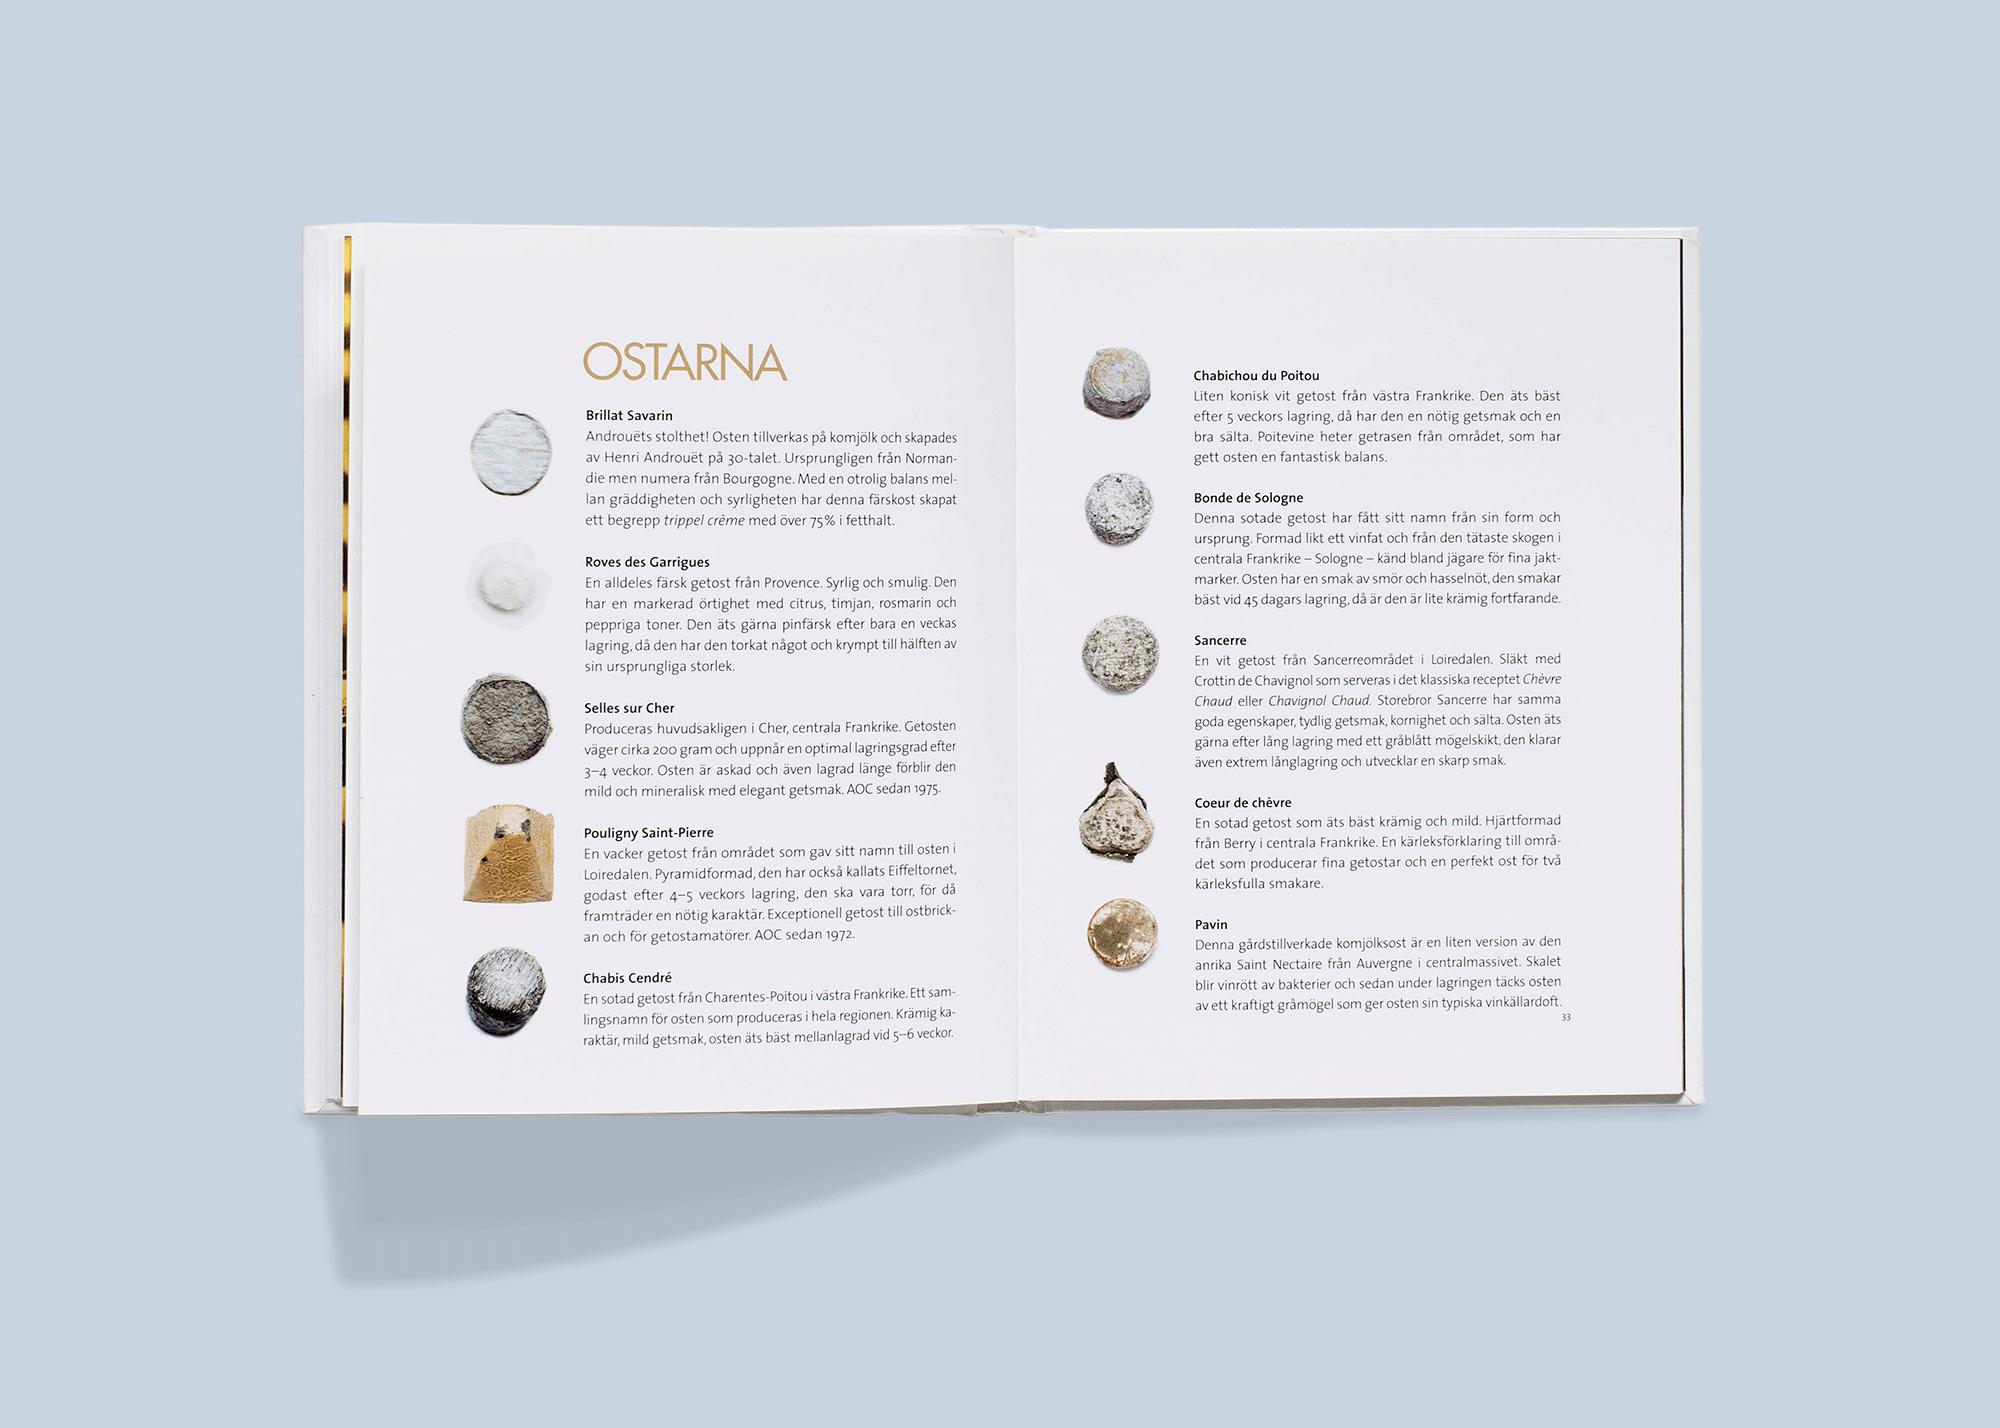 lilla-boken-om-champagne_3.png